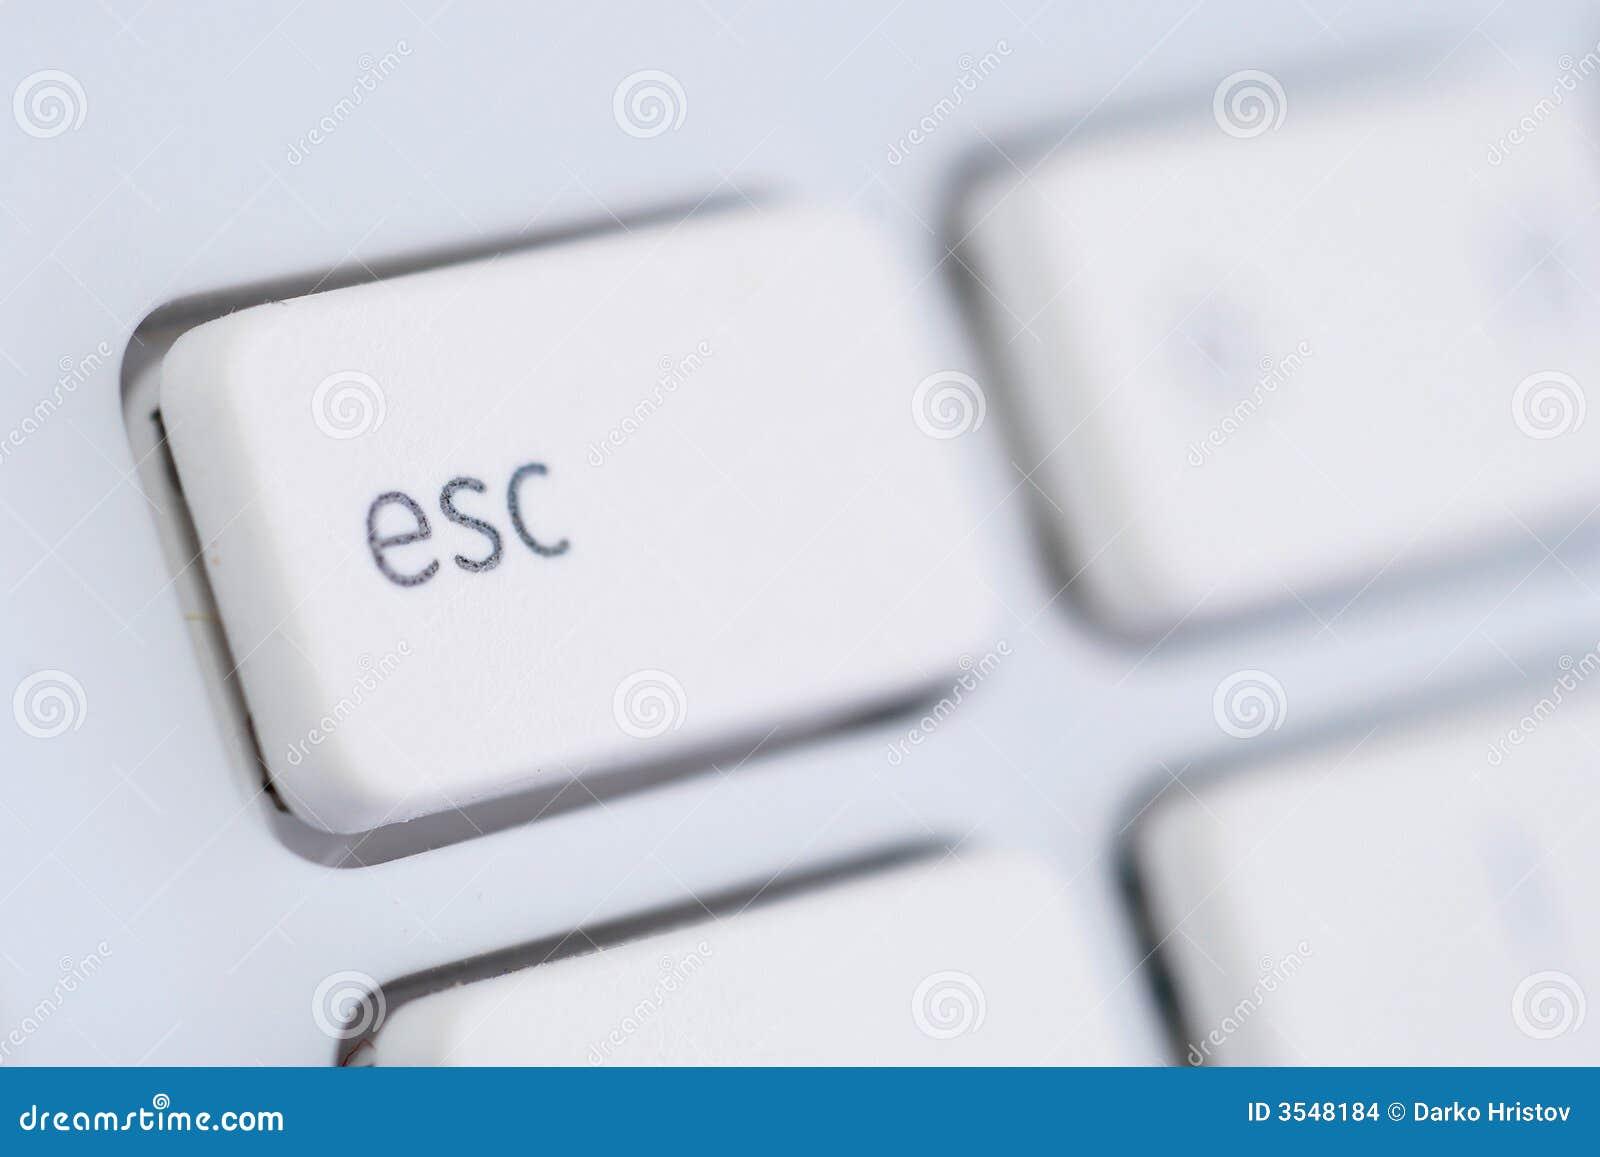 White för datoresc-tangentbord